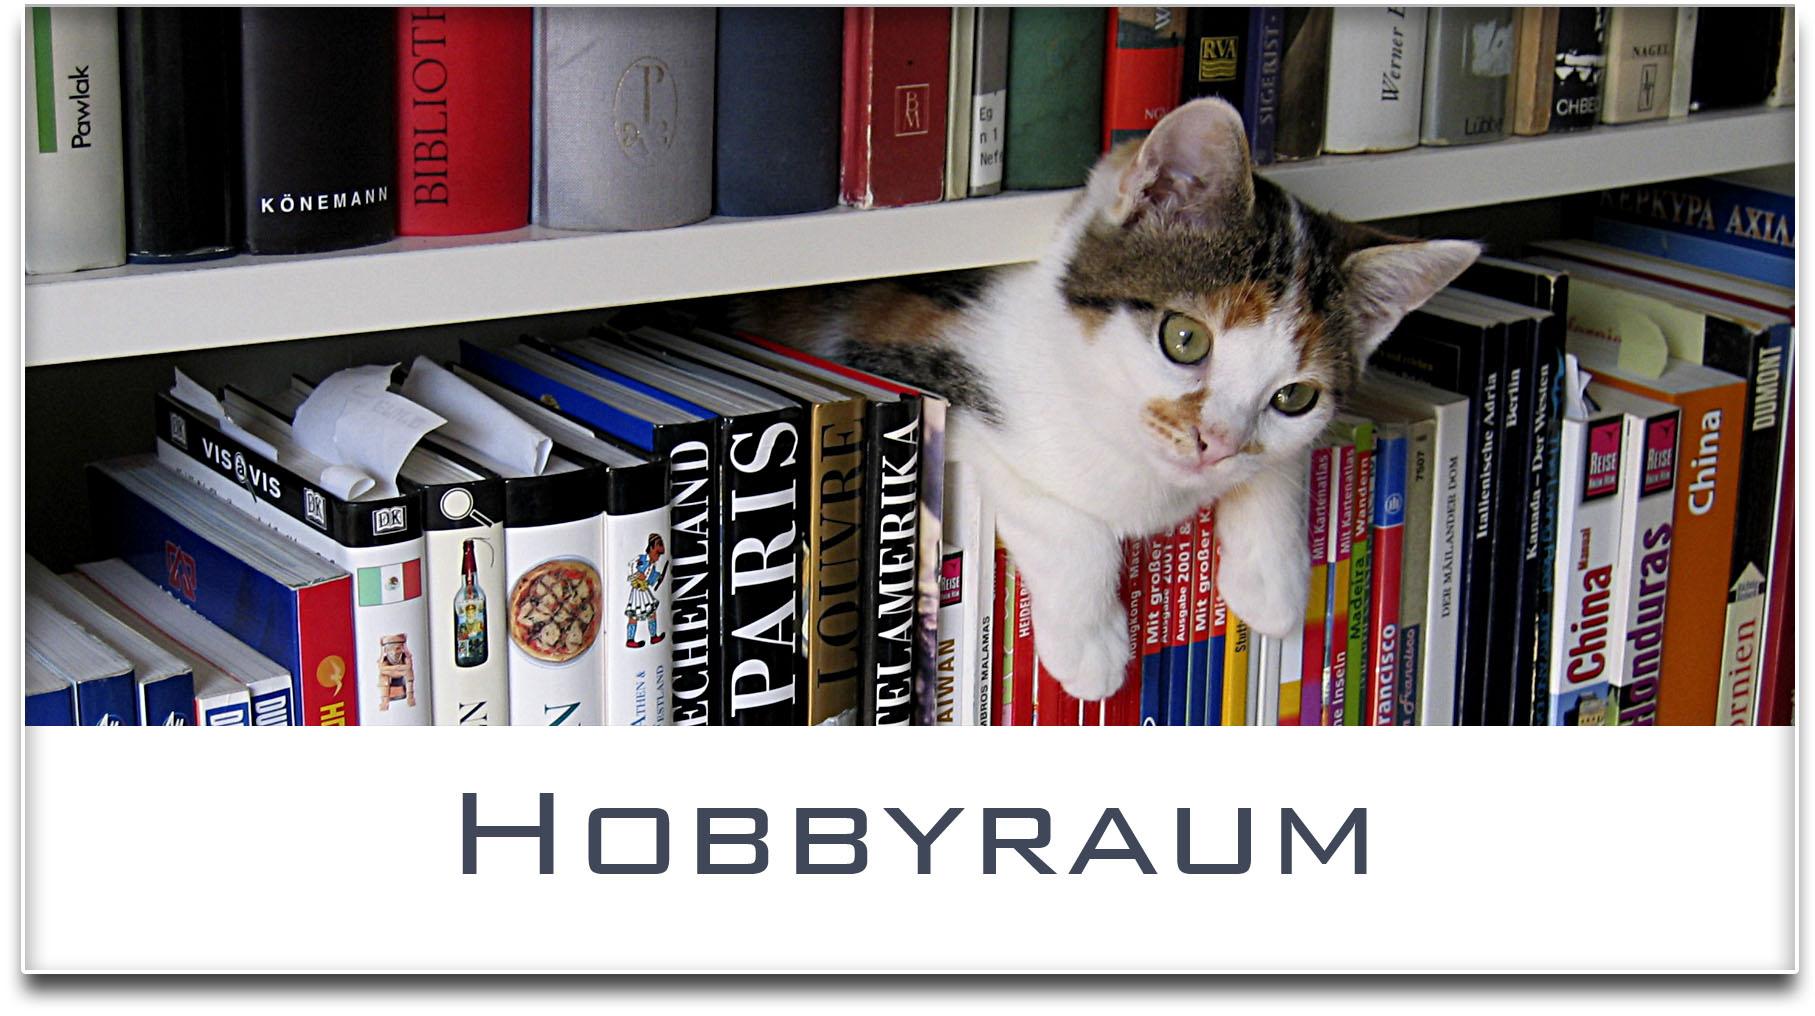 Türschild / Haustürschild / Katze / Bücherregal / Hobbyraum / Selbstklebend